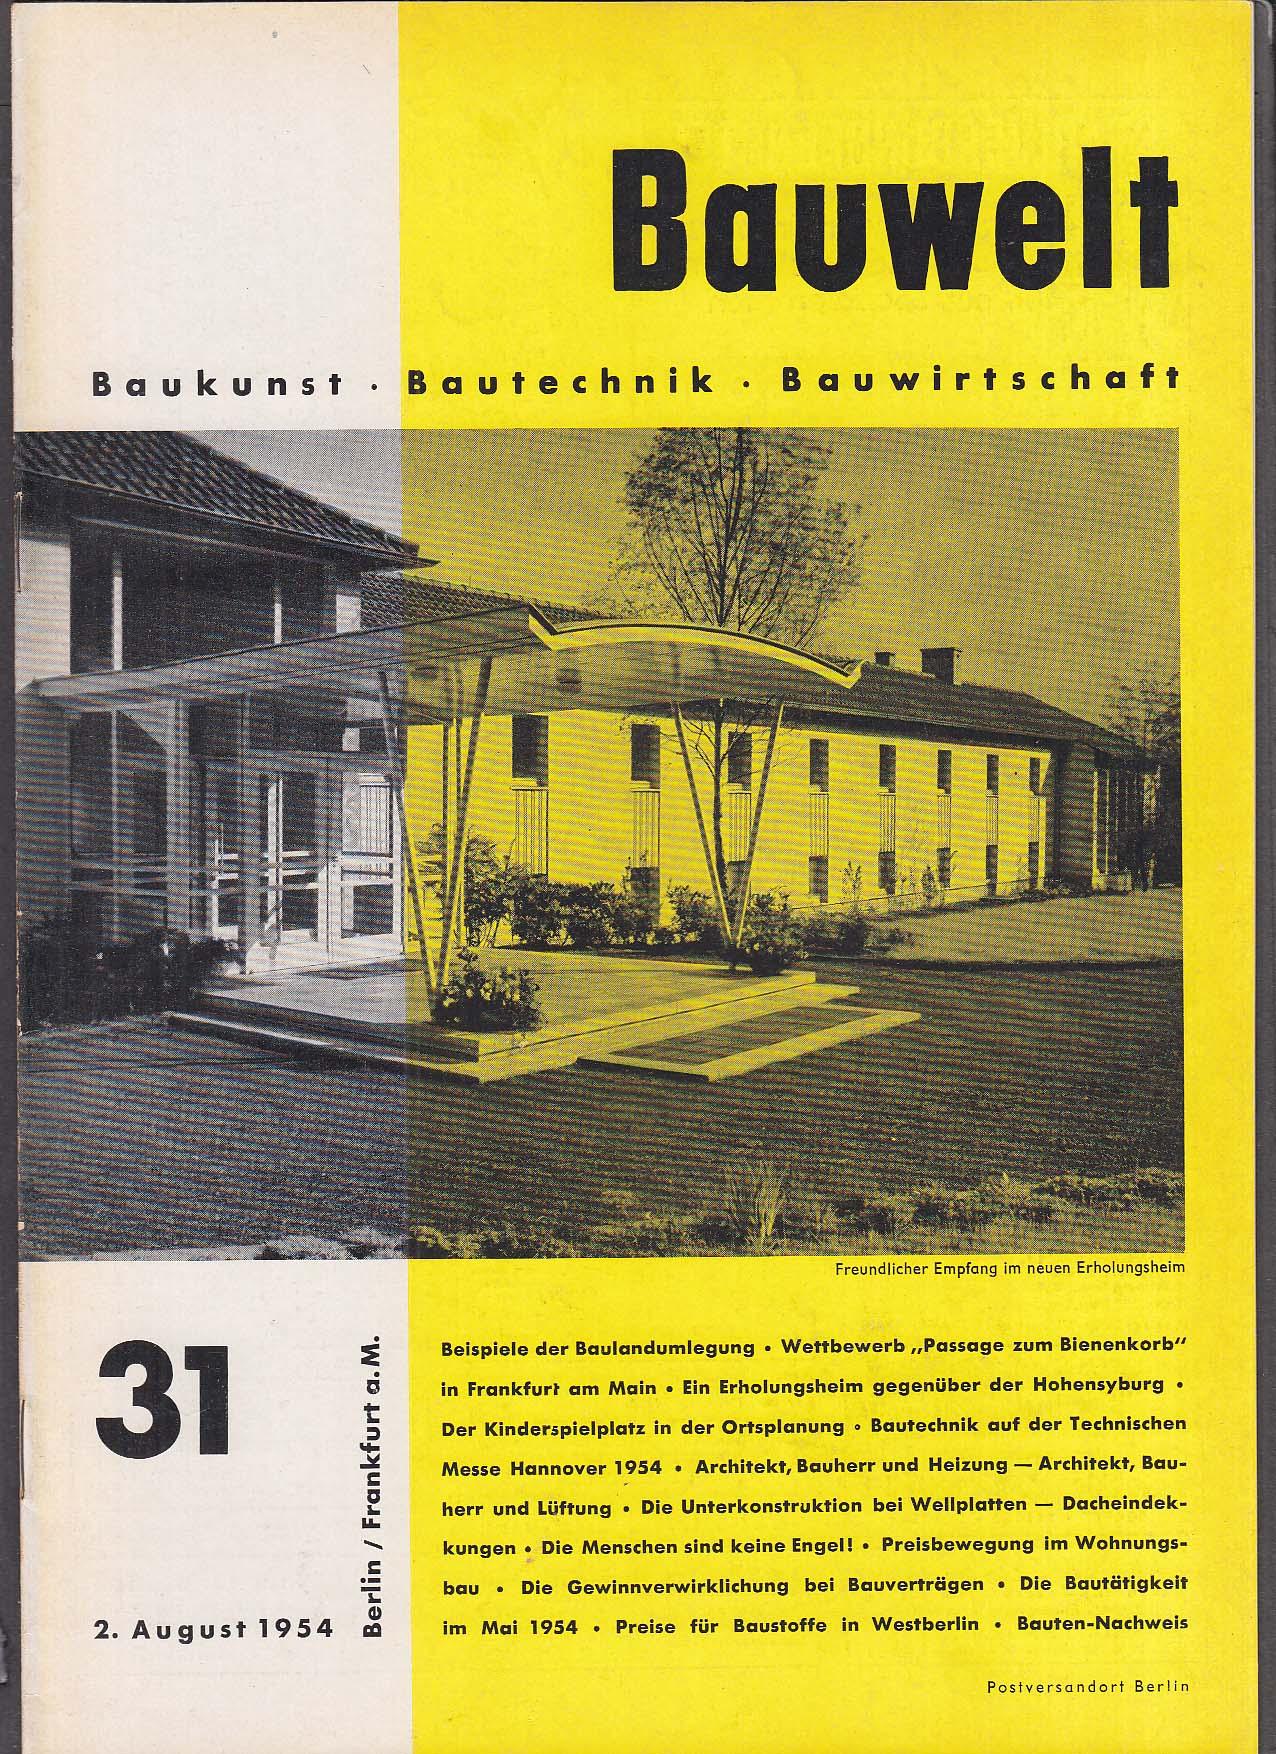 Bauwelt German architecture magazine 8/2/1954 31